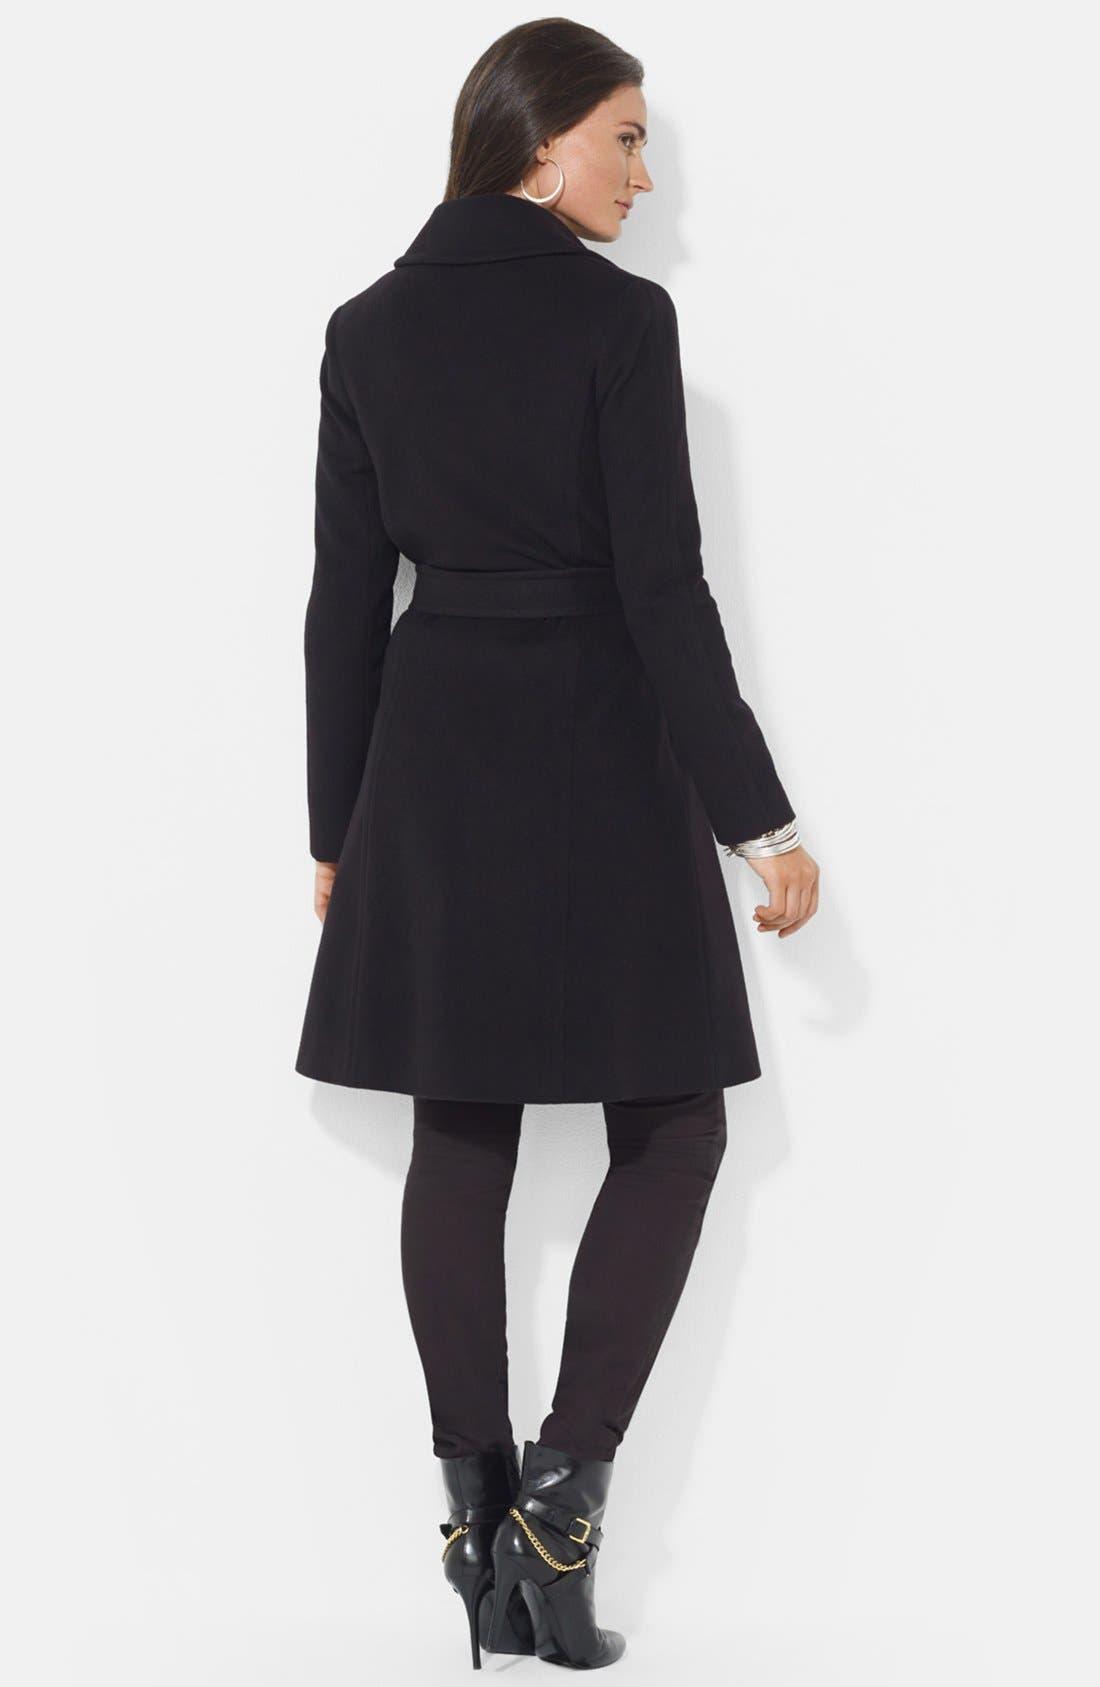 LAUREN RALPH LAUREN,                             Wool Blend Wrap Coat,                             Alternate thumbnail 2, color,                             BLACK